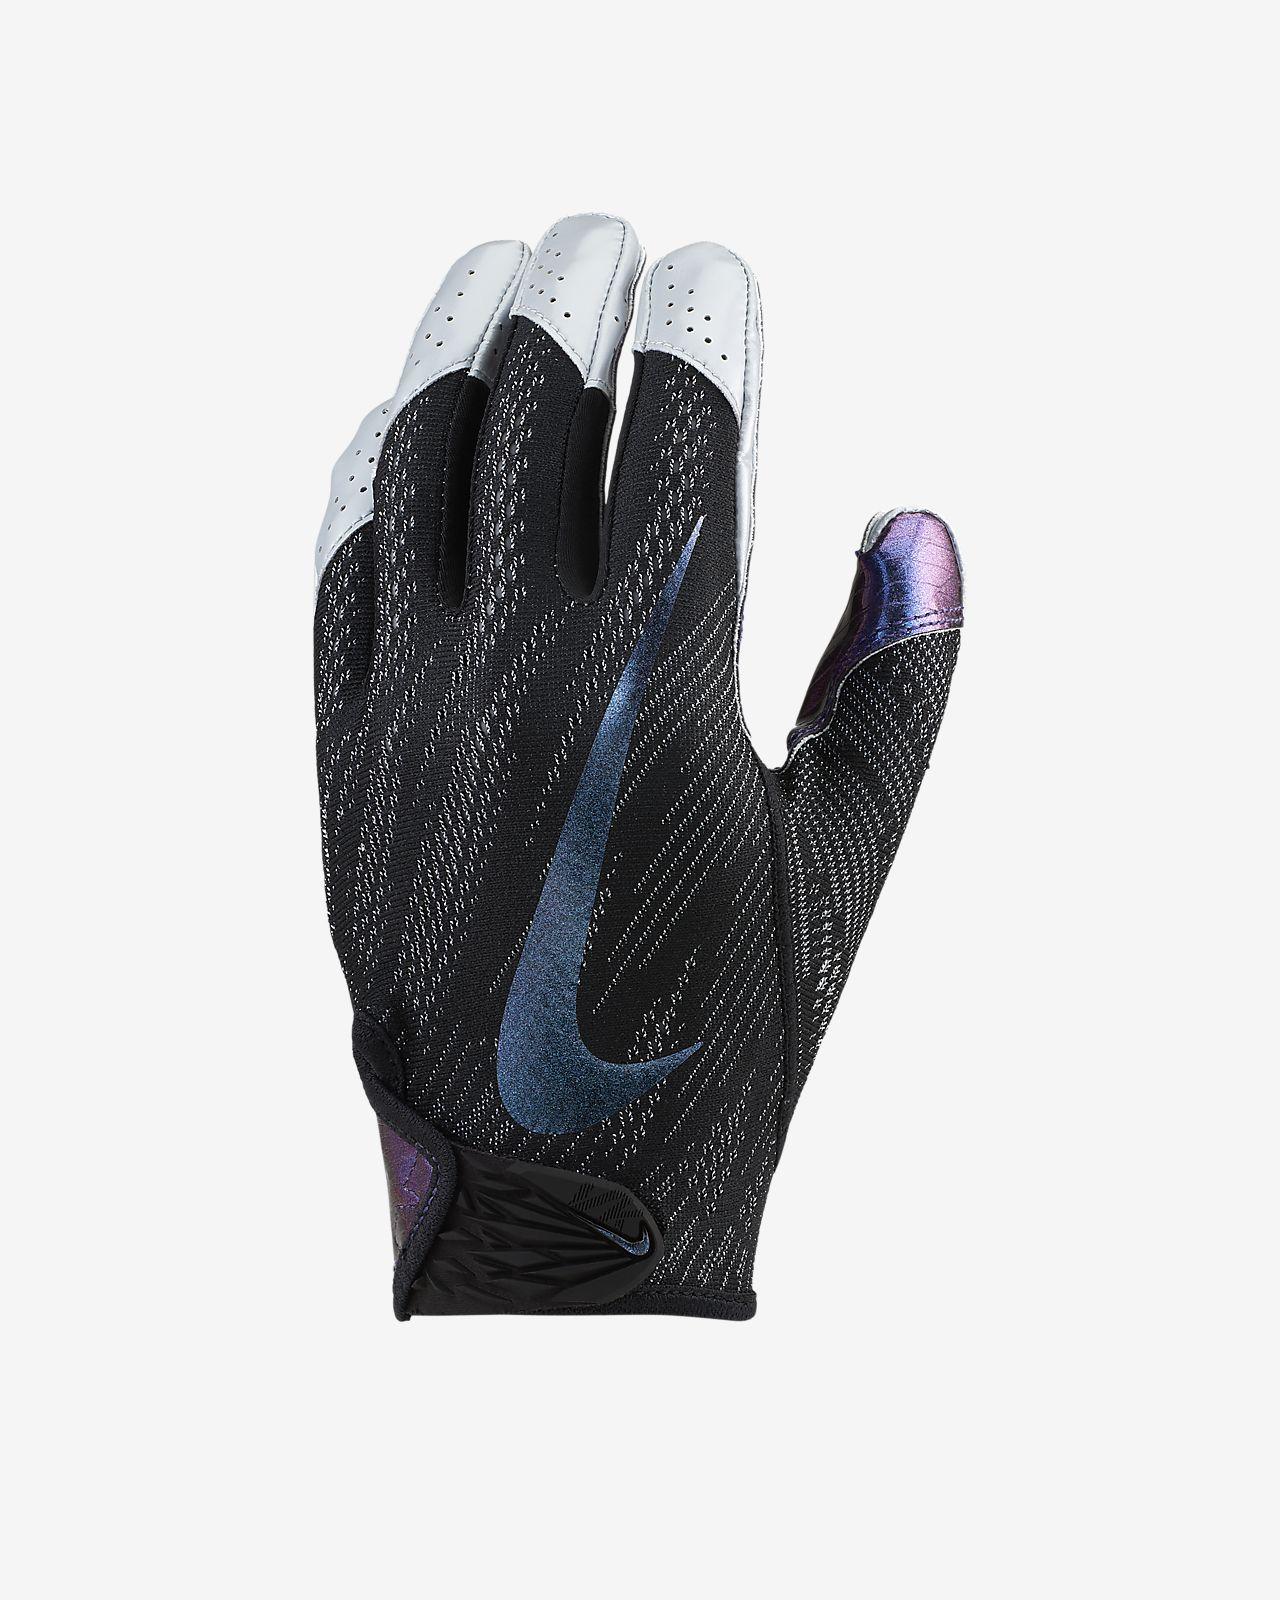 Nike Gloves Football: Nike Vapor Knit 2.0 Football Gloves. Nike.com